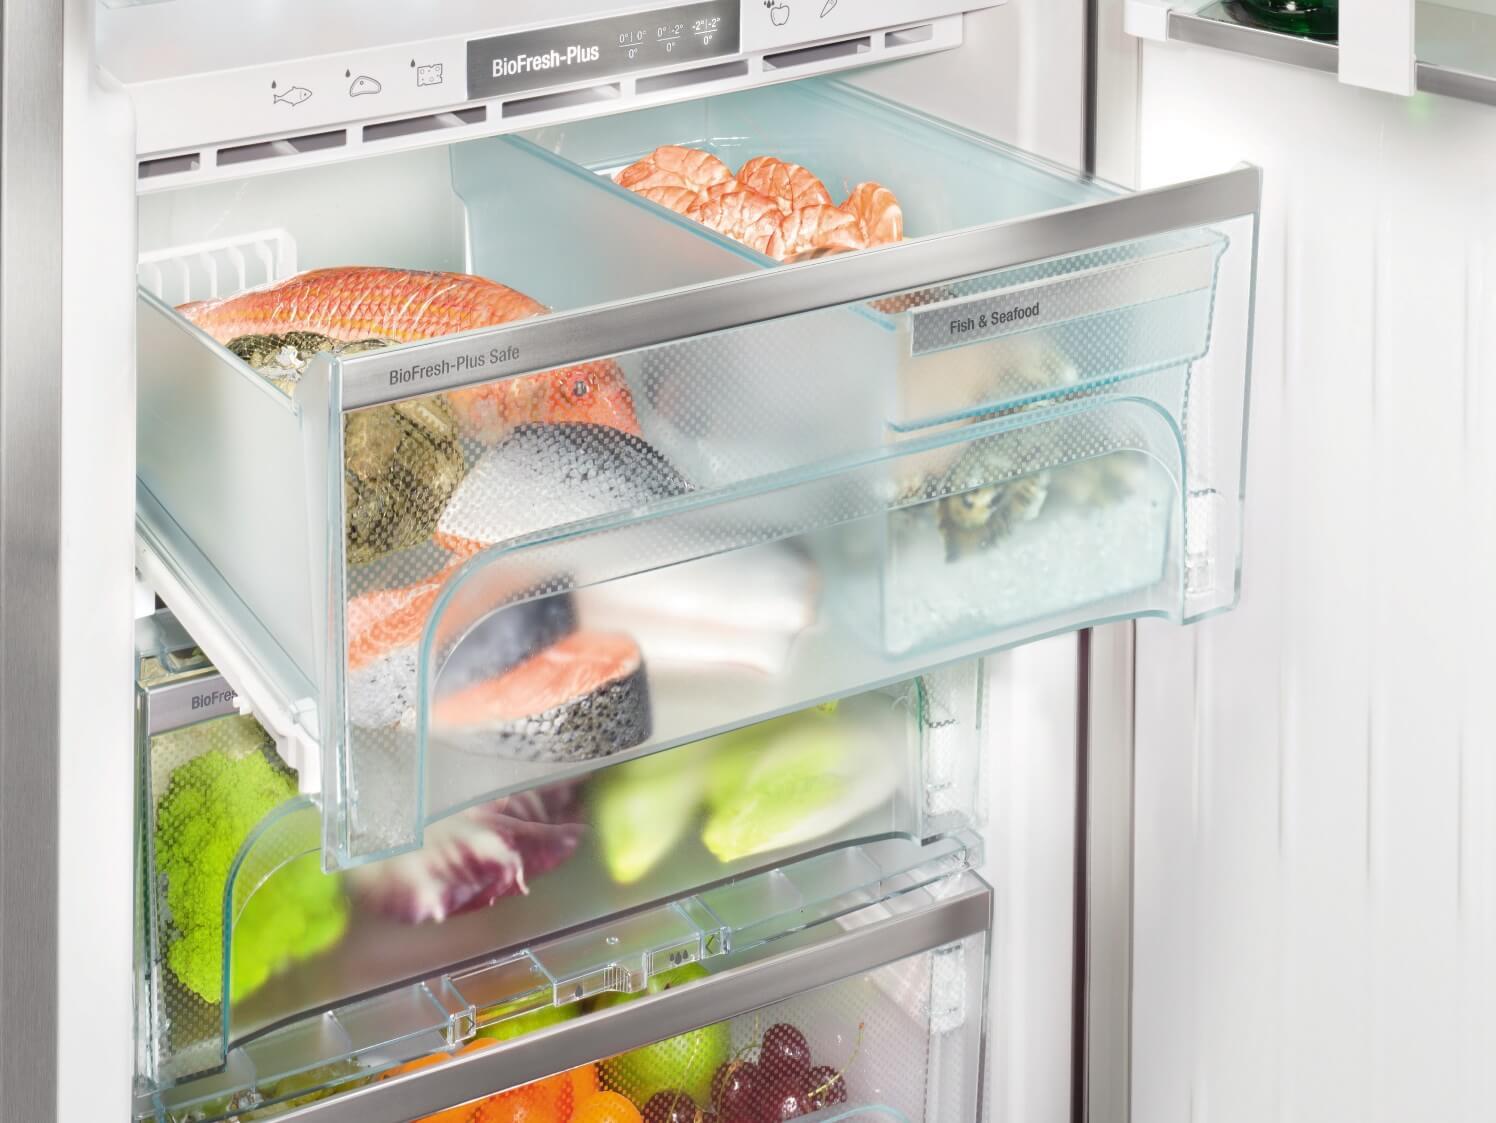 купить Side-by-Side холодильник Liebherr SBSes 8486 Украина фото 14